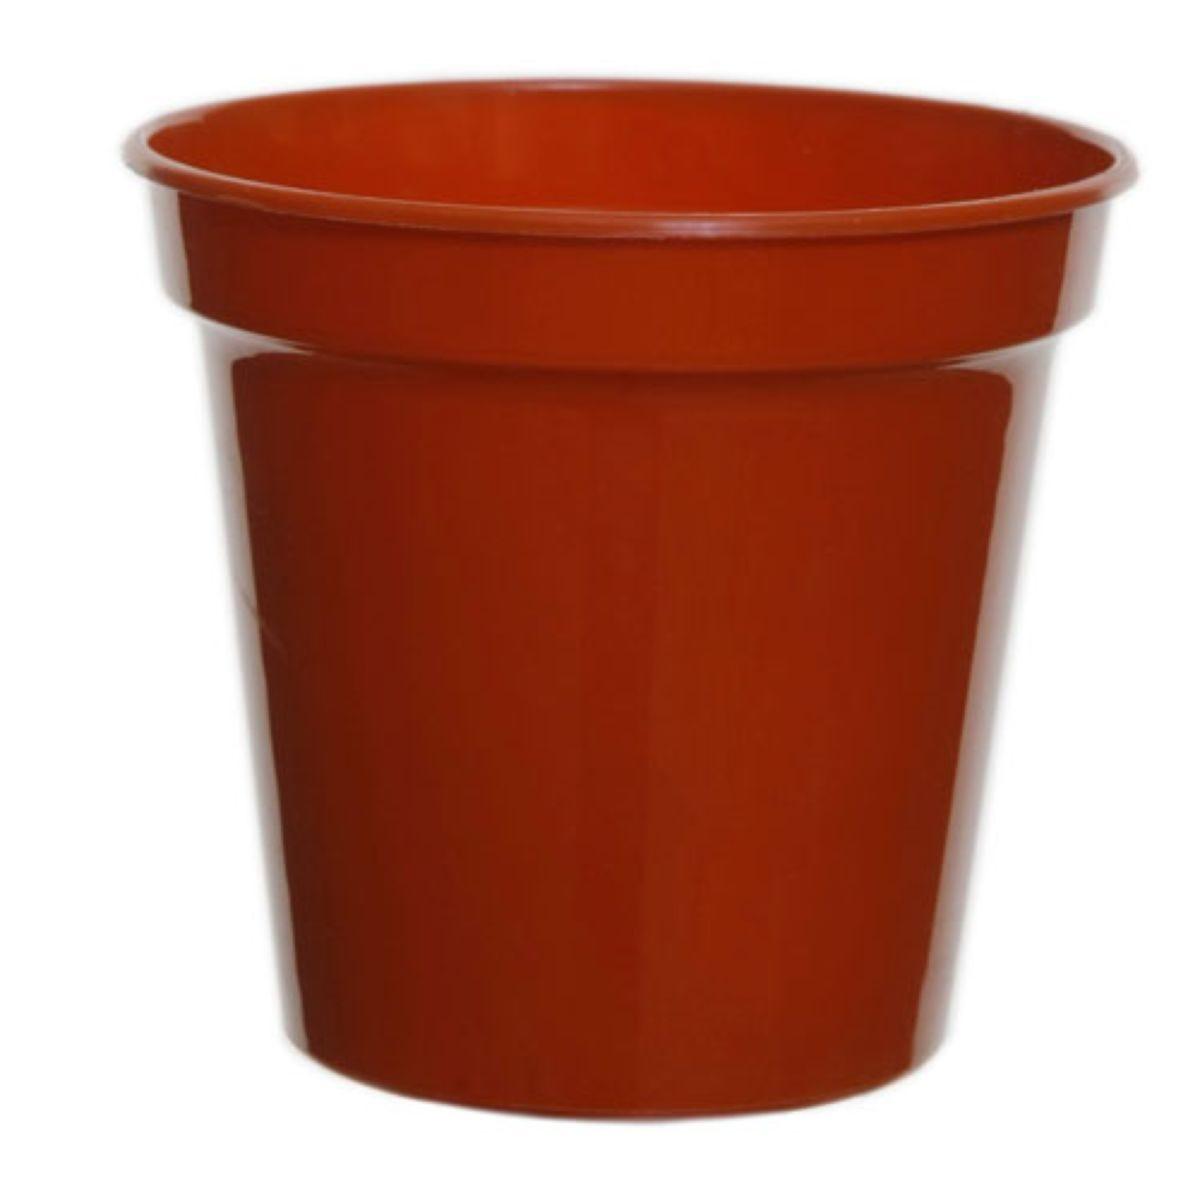 Whitefurze 7.5cm Pot – Pack of 10